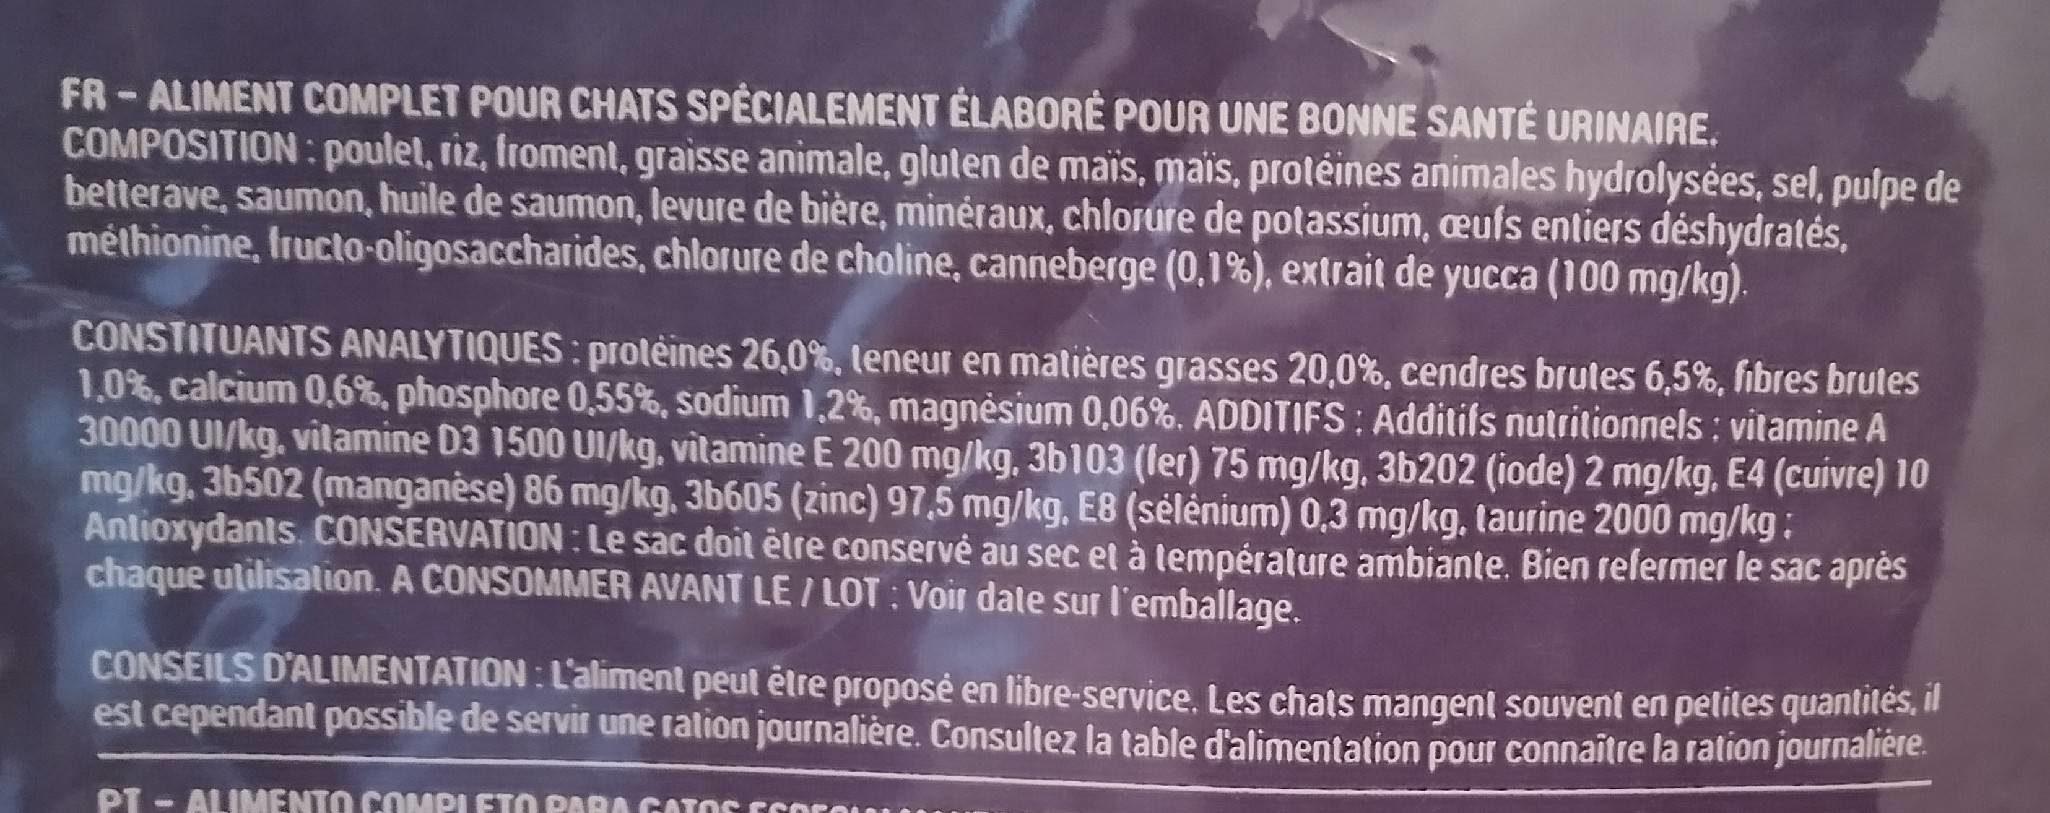 Urinary - Ingrédients - fr